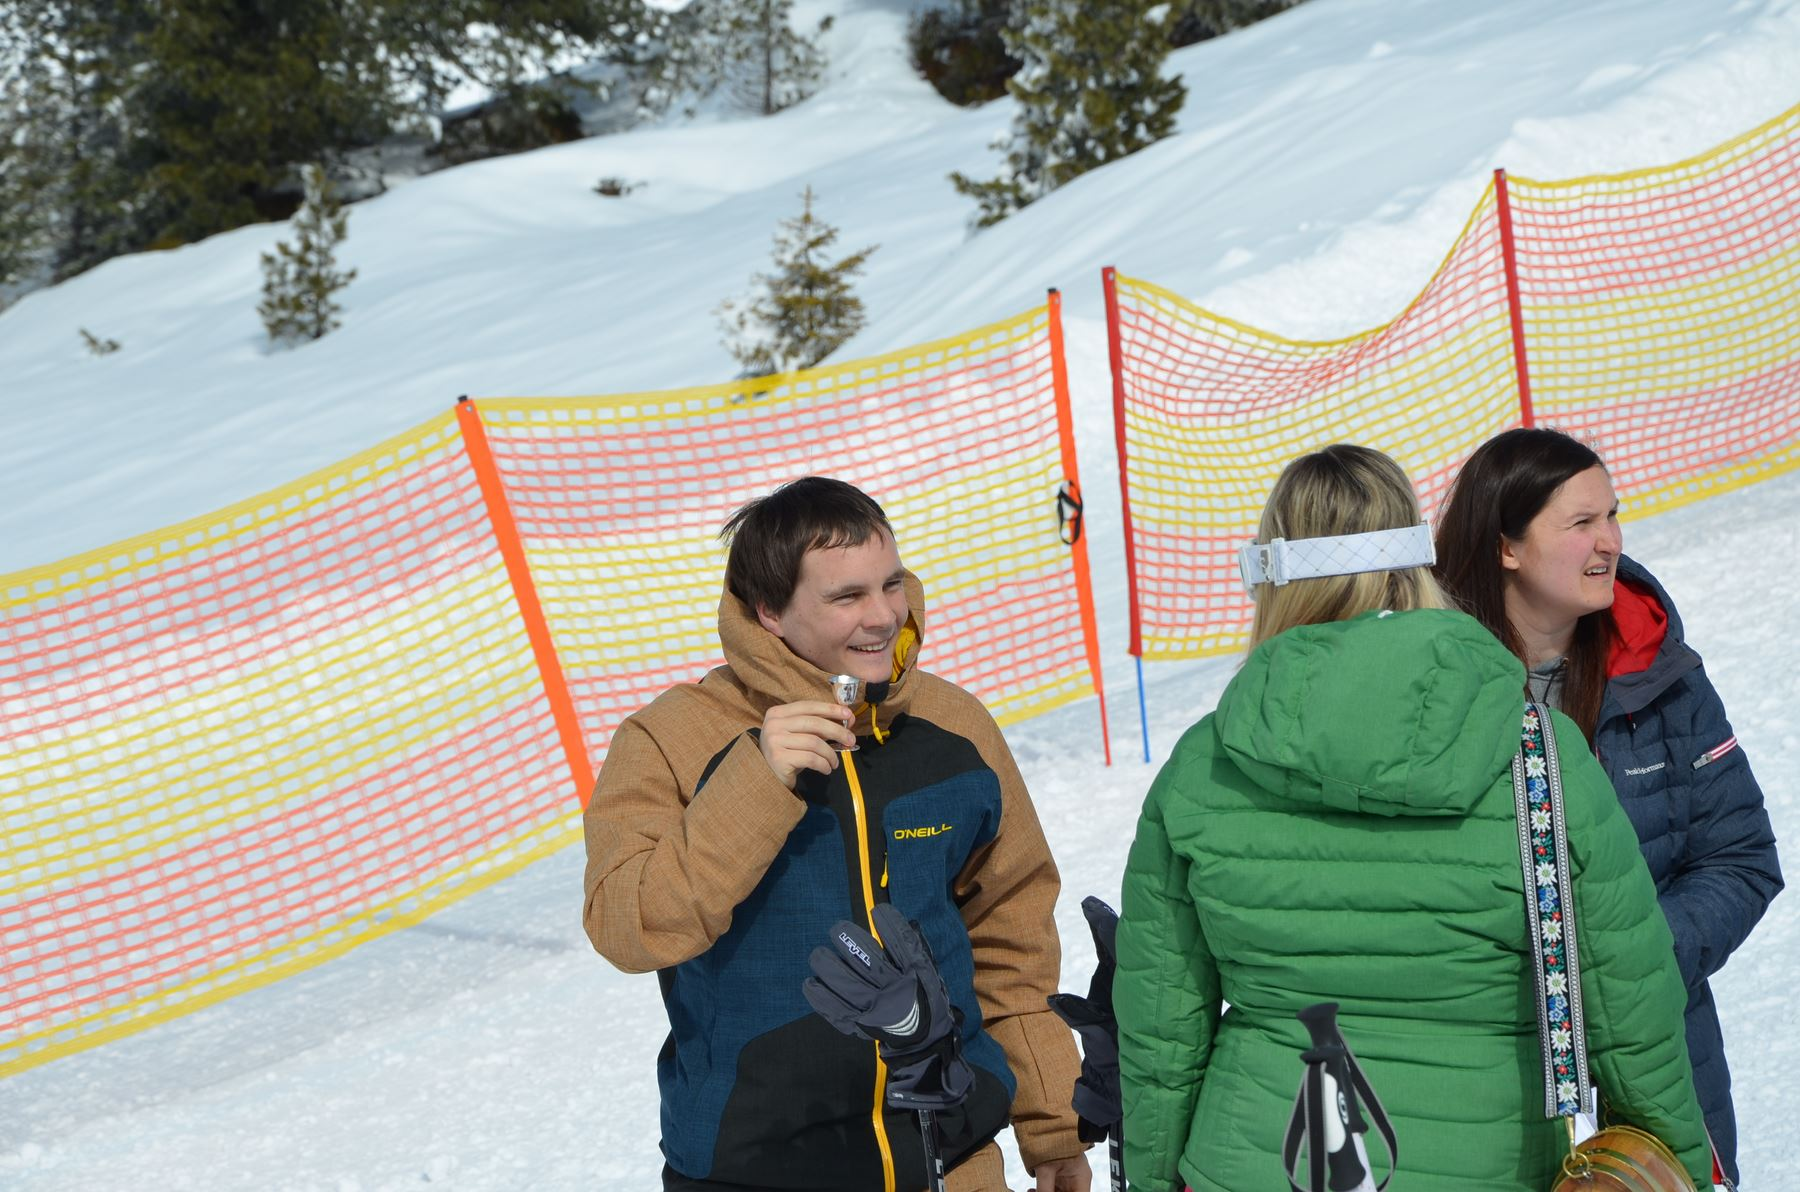 2015-03-22 BV Zillertal Skirennen 283.JPG